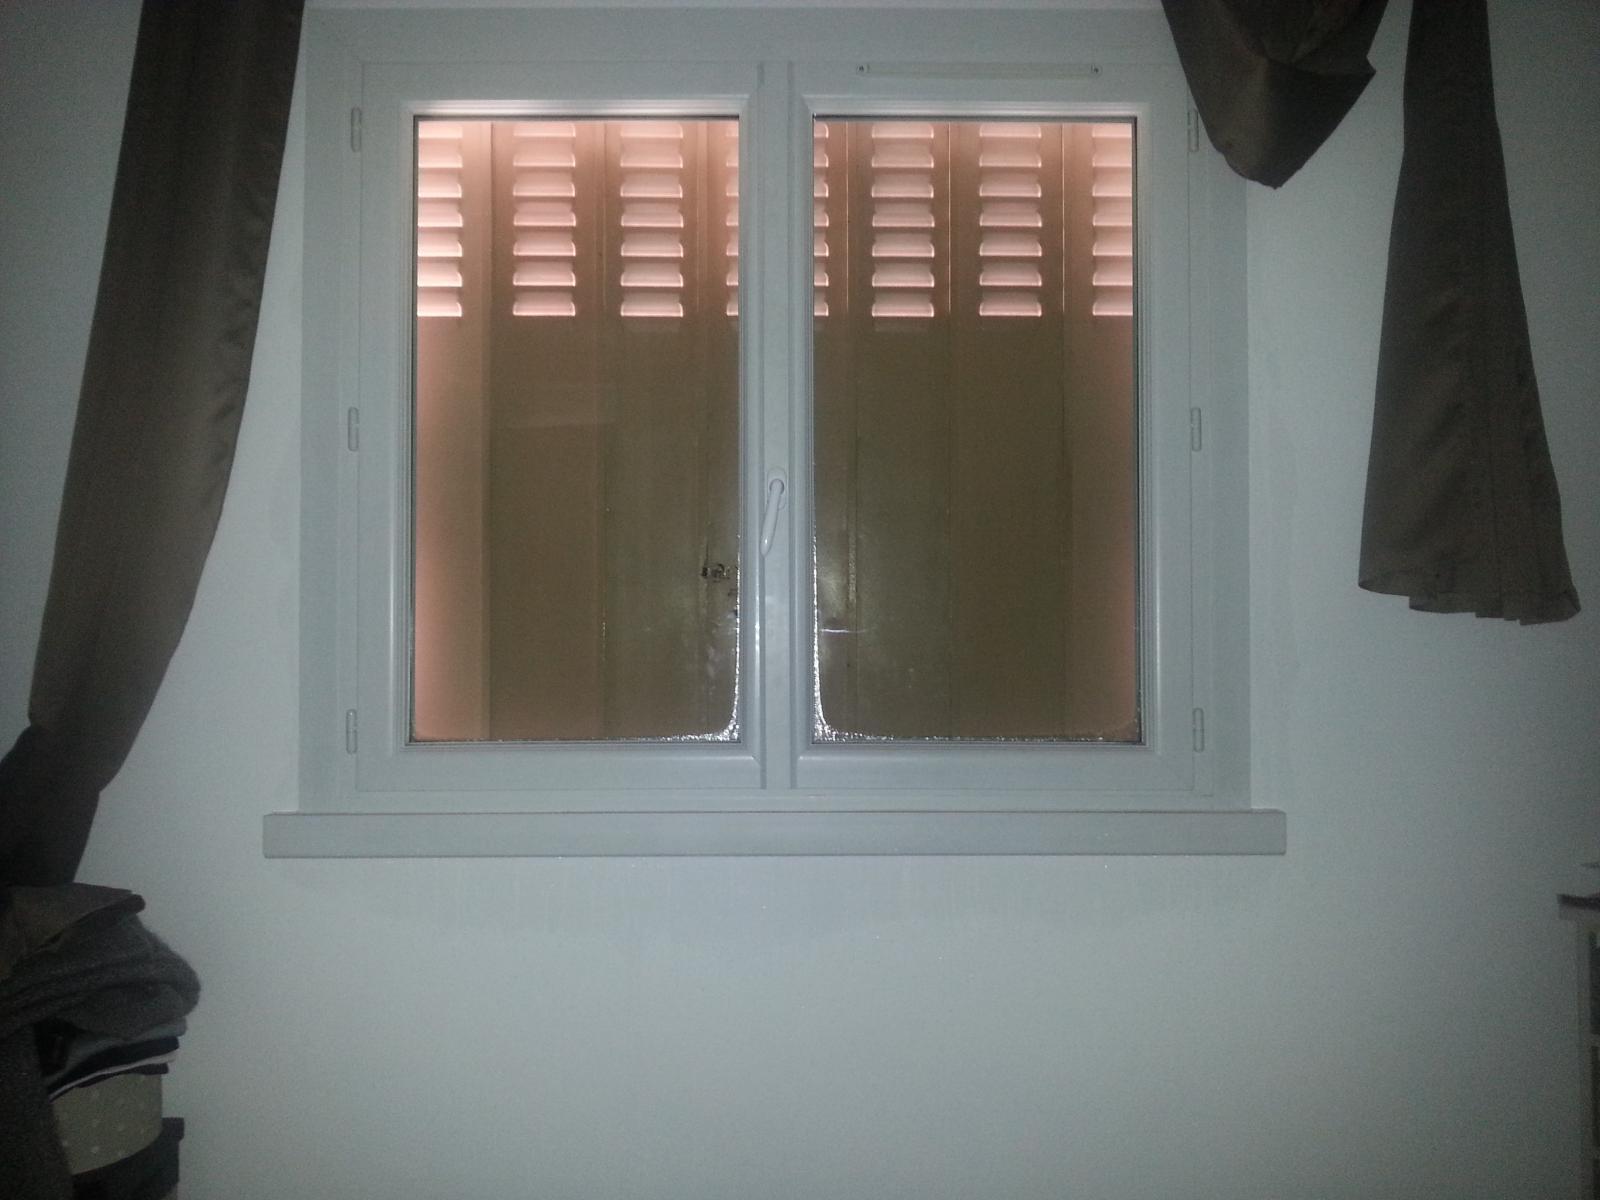 Faux plafond salle de bain humidite - Condensation salle de bain ...